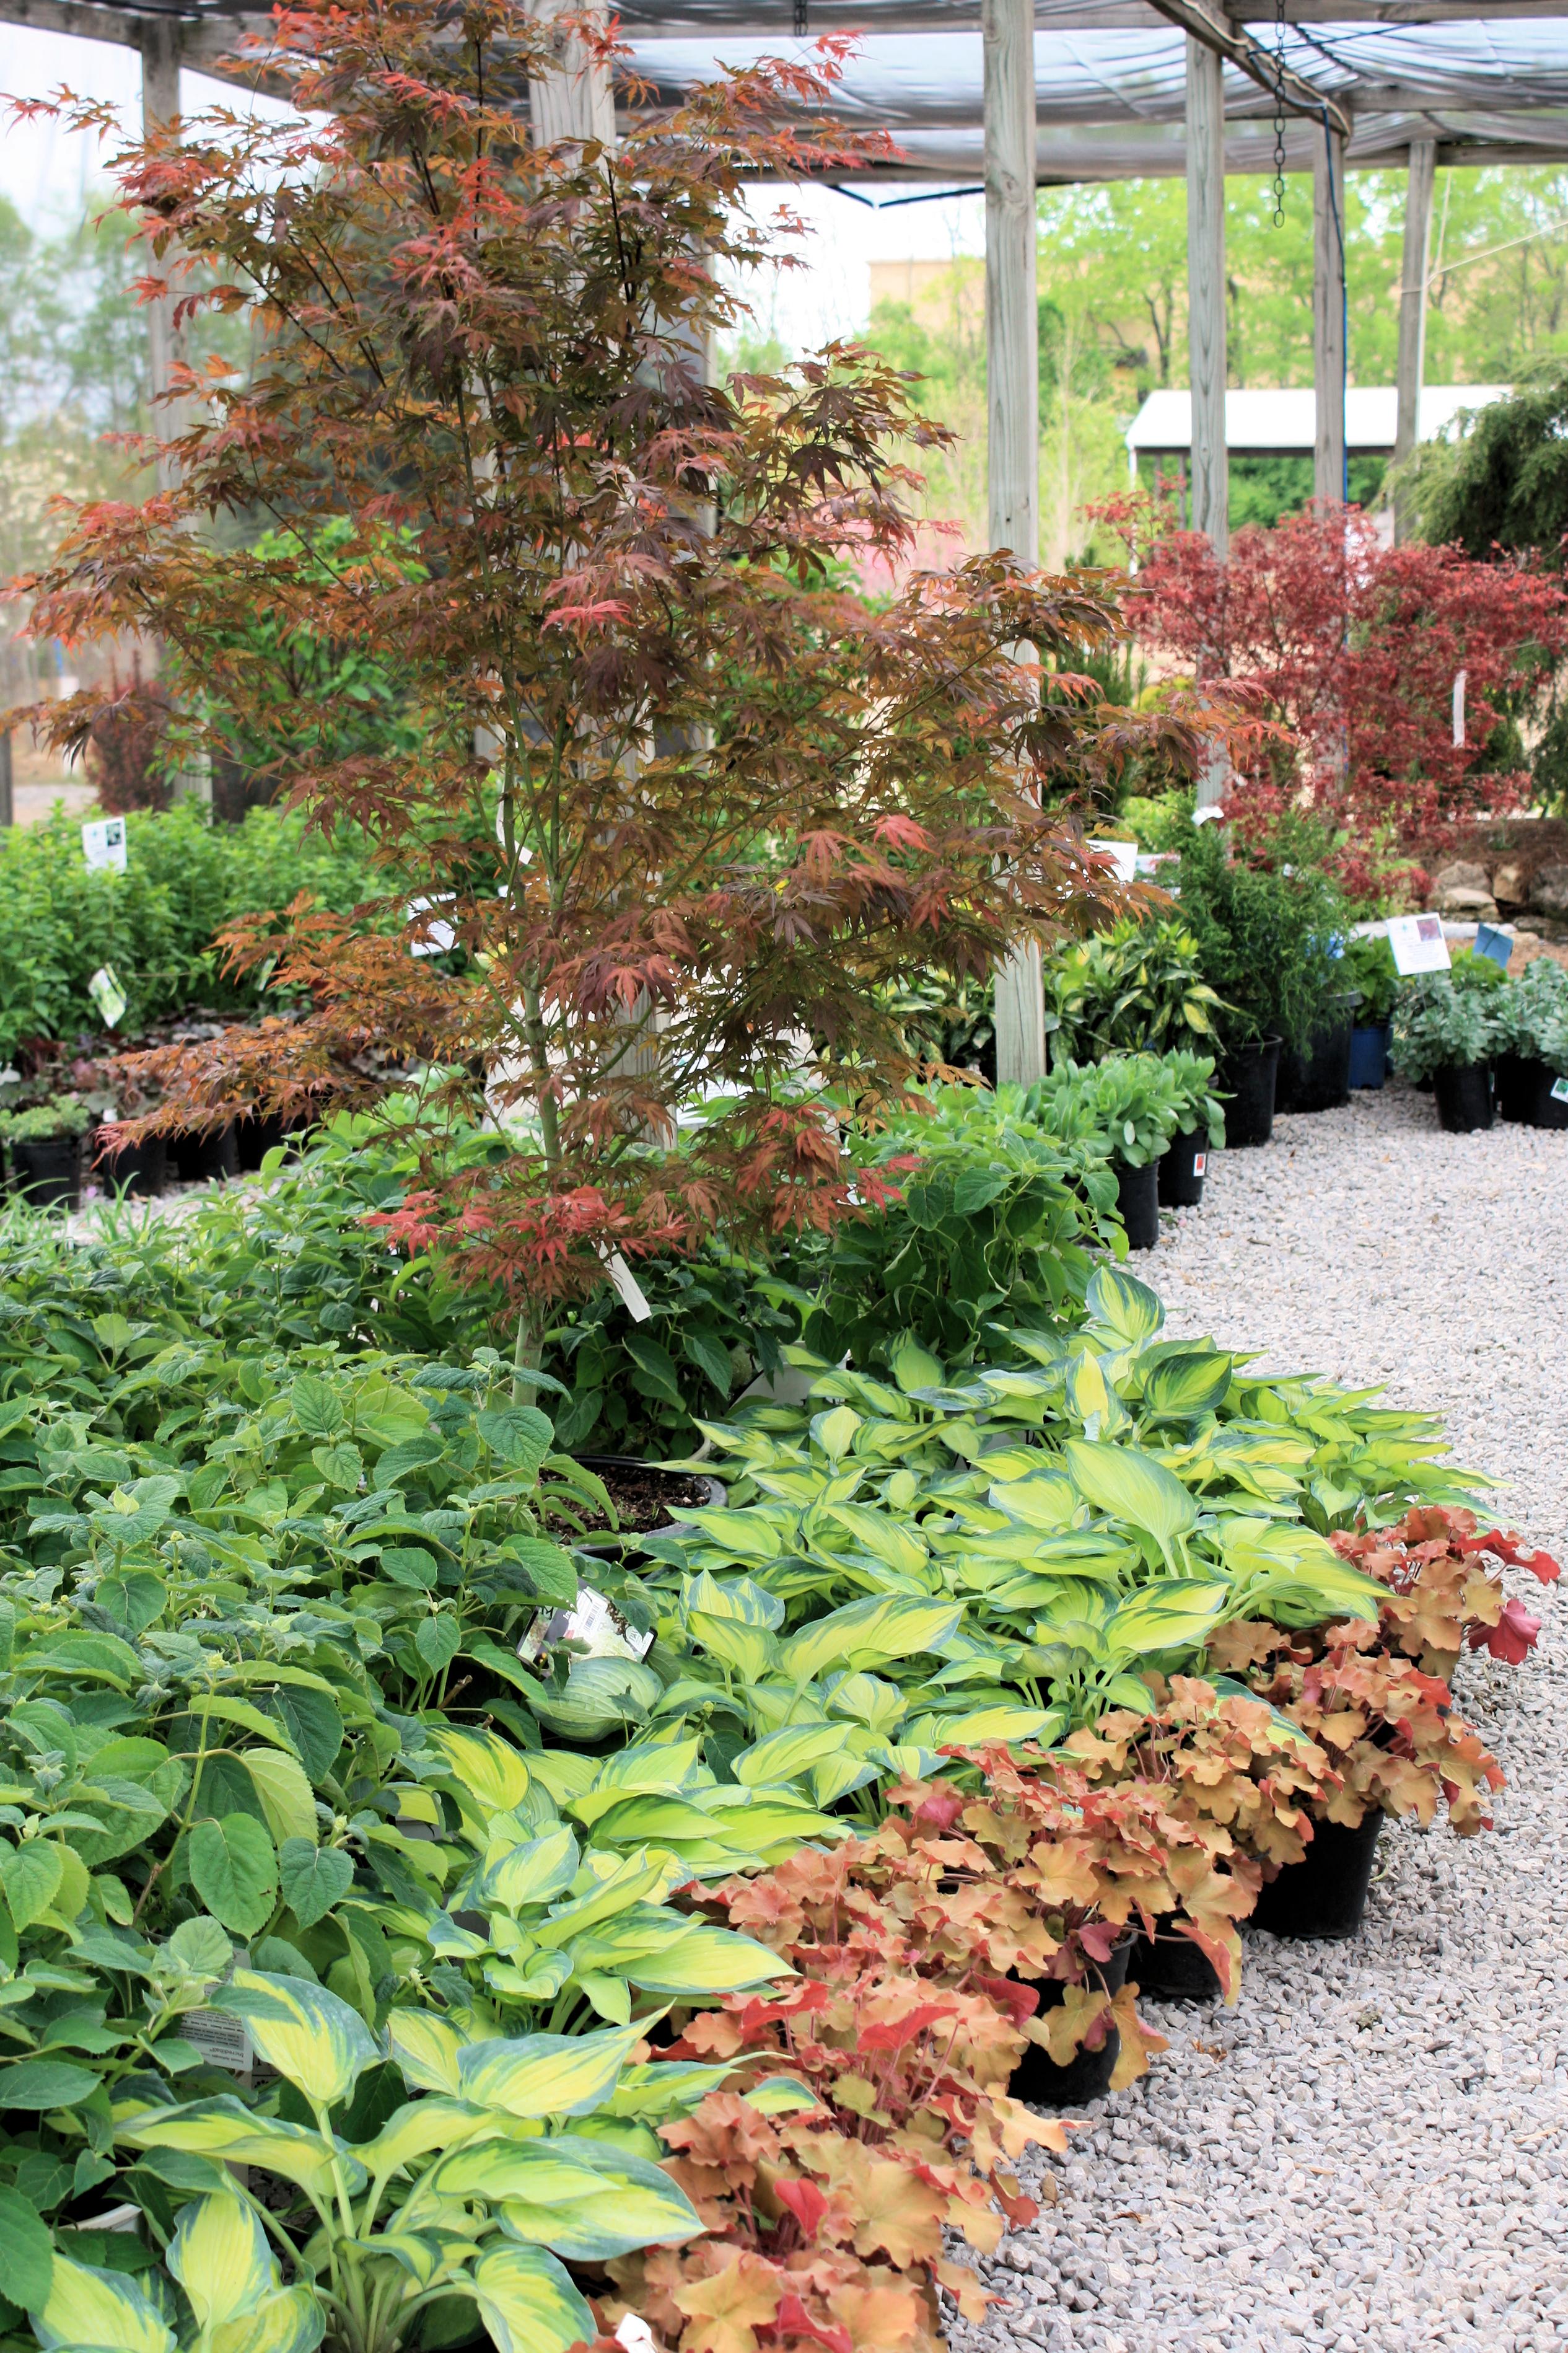 Garden Center & Tree Nursery in Nicholasville, KY | Glynn Young\'s